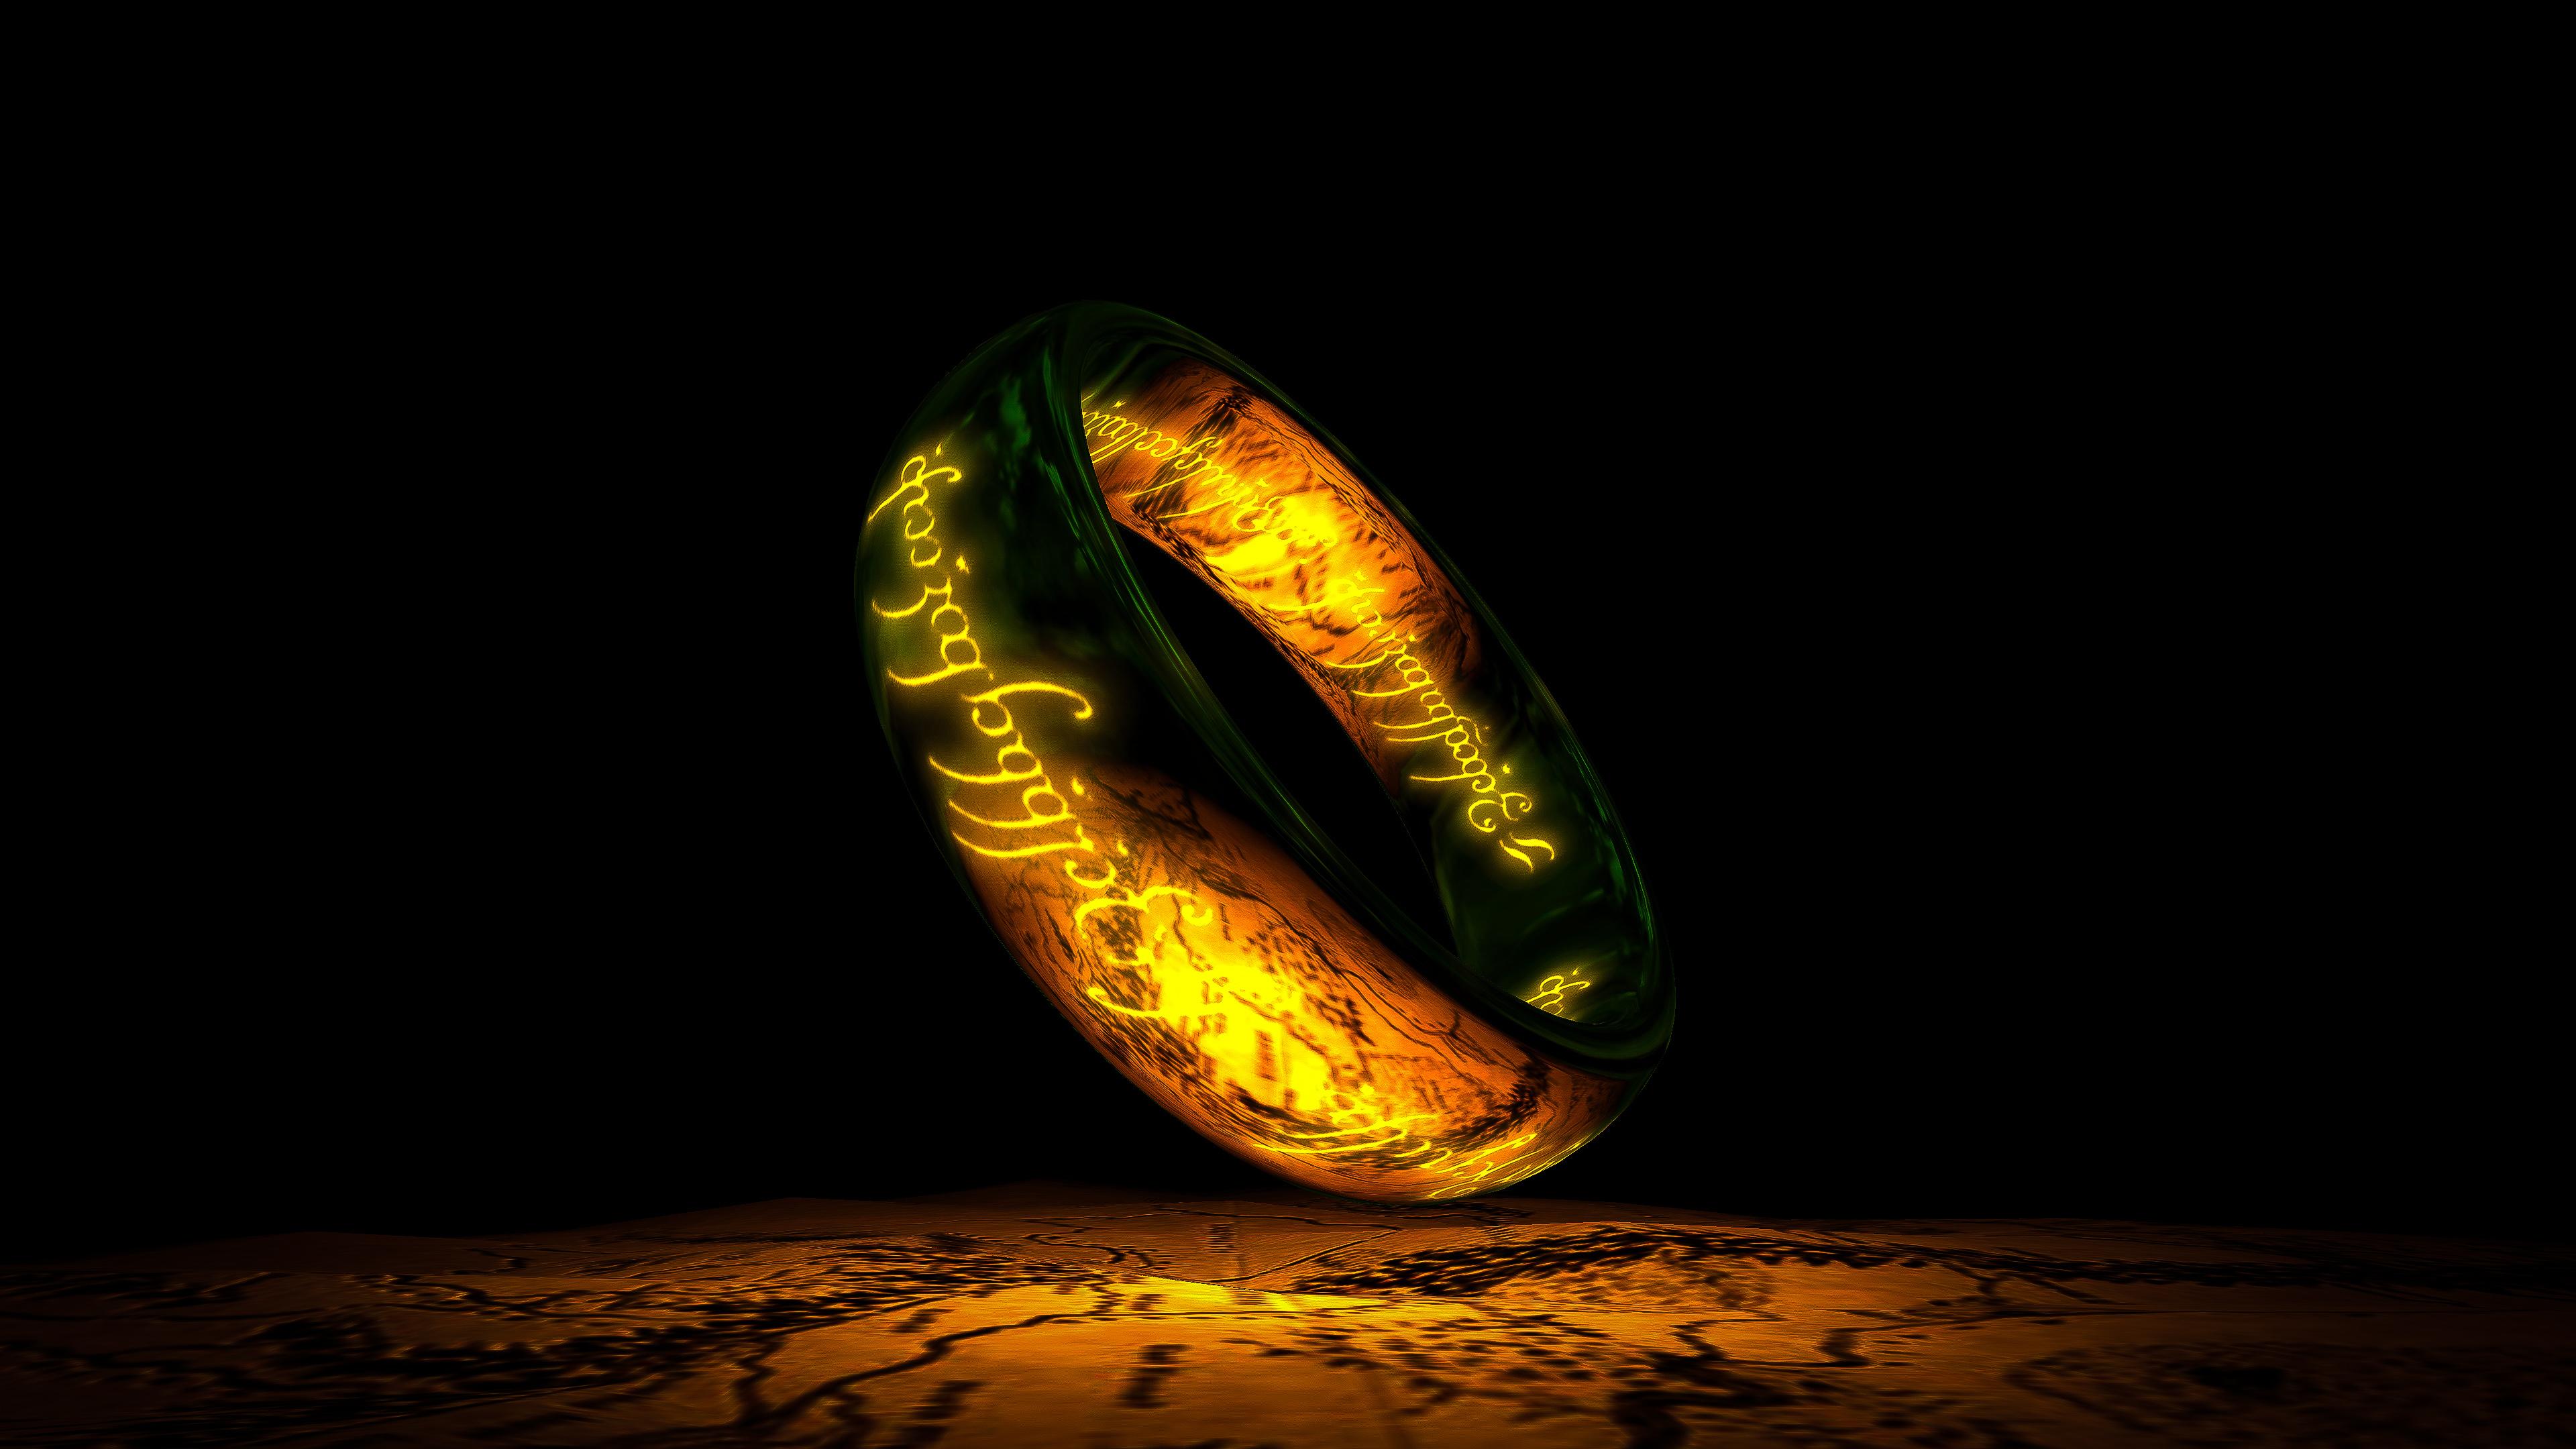 The One Ring 4k Ultra Fondo De Pantalla Hd Fondo De